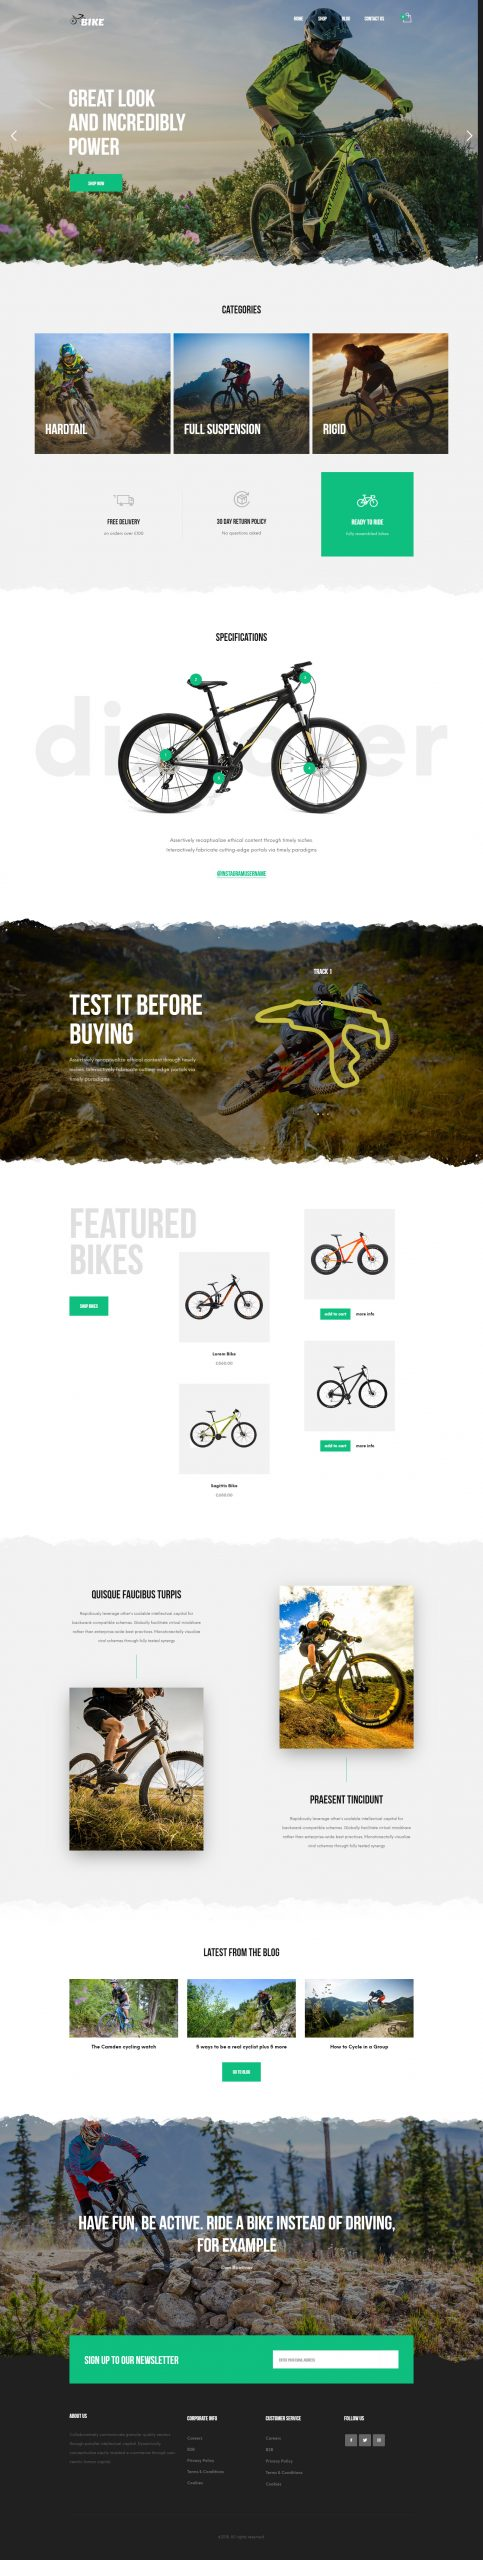 bike cycle website template